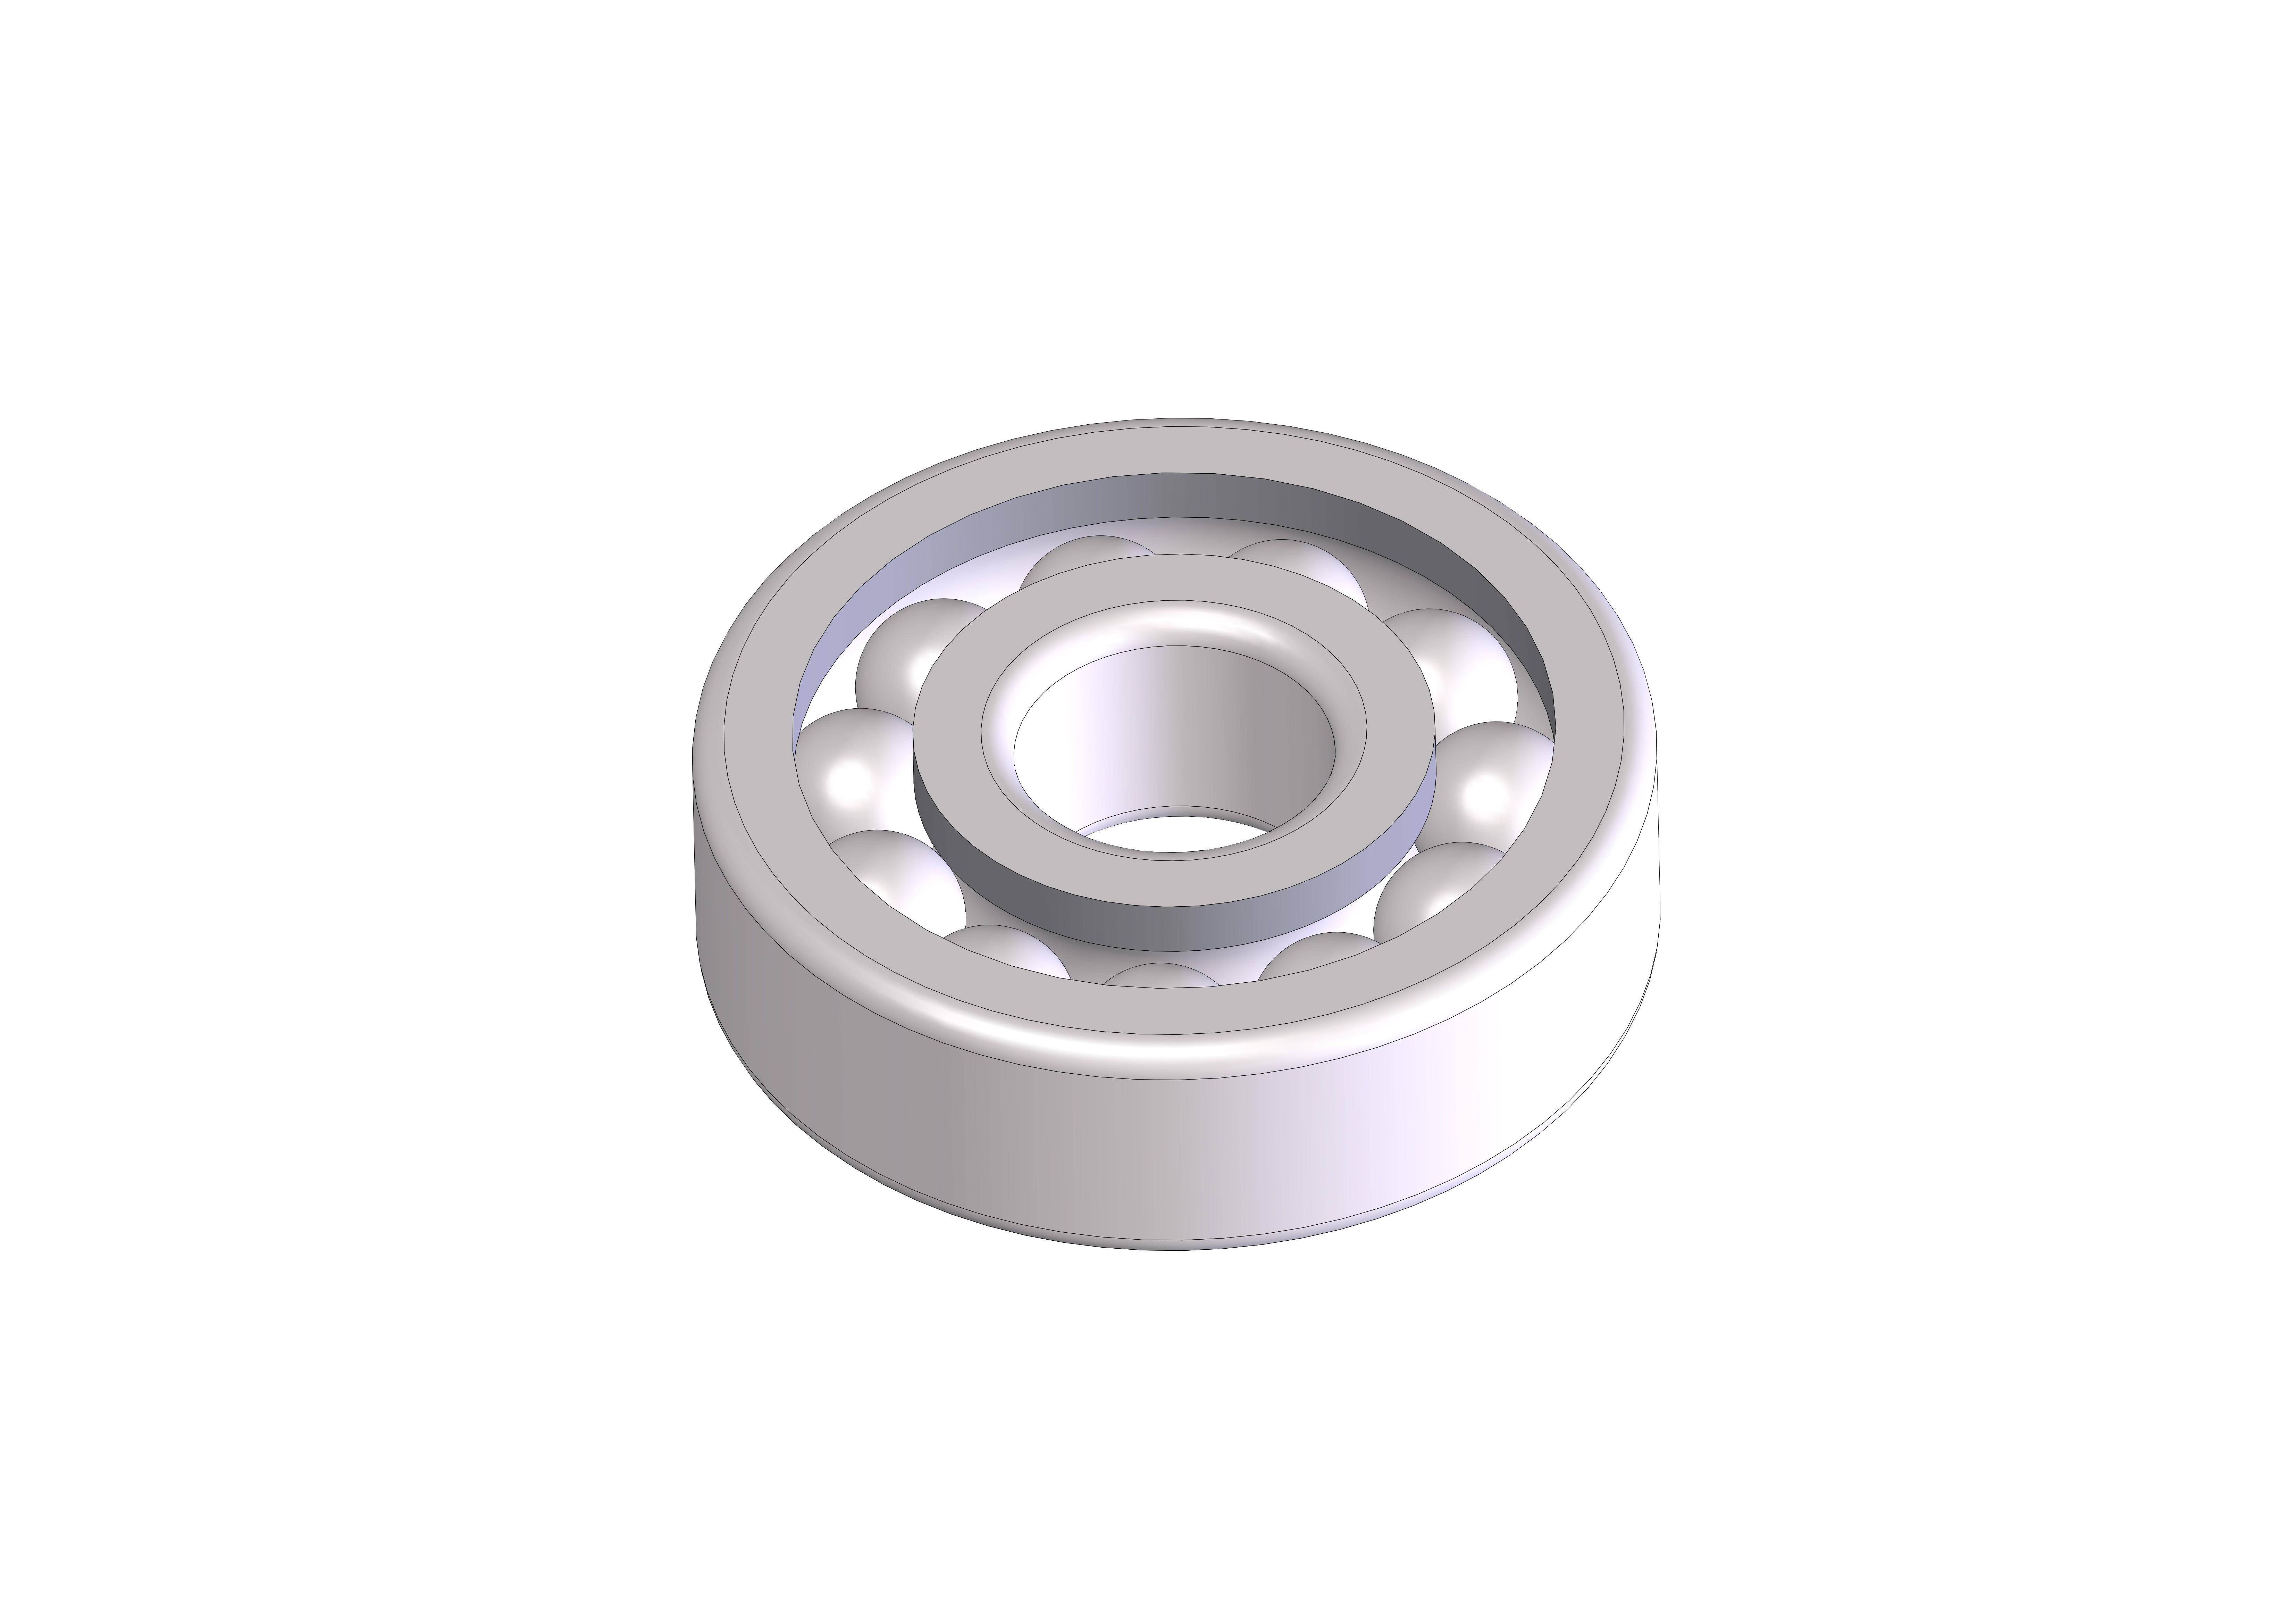 ROULEMENT  d08-D24-h07 mm C.JPG Download STL file ROLLING 08-24-07 Bearing 628 • 3D printer design, Laurence